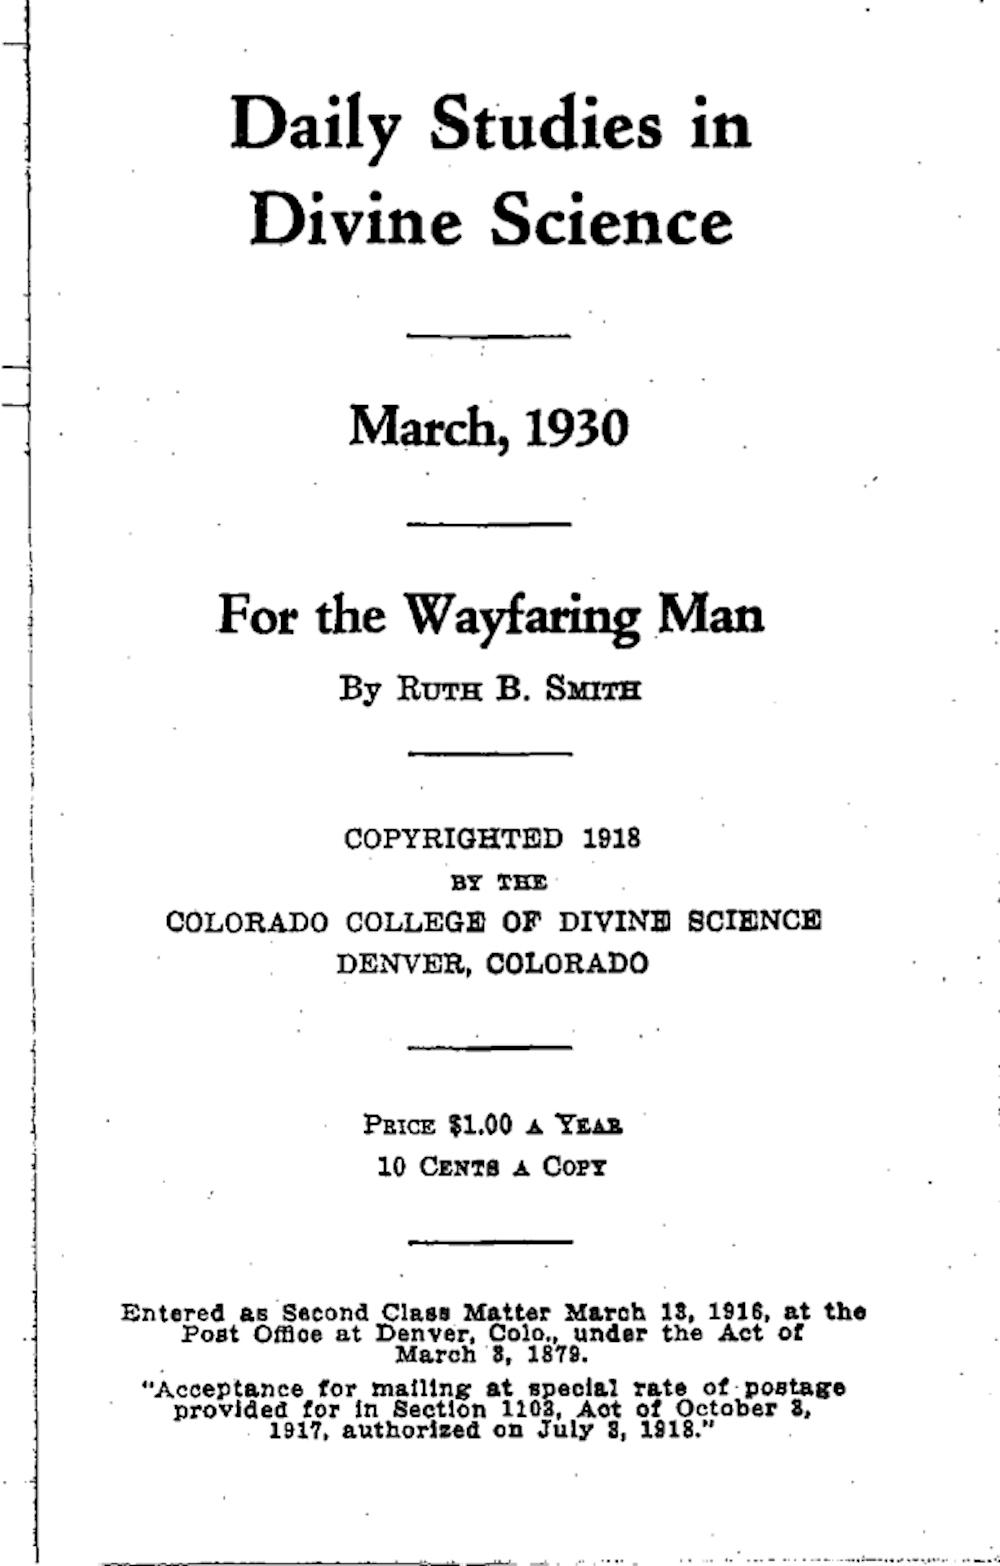 essay on scientific spirit in daily life